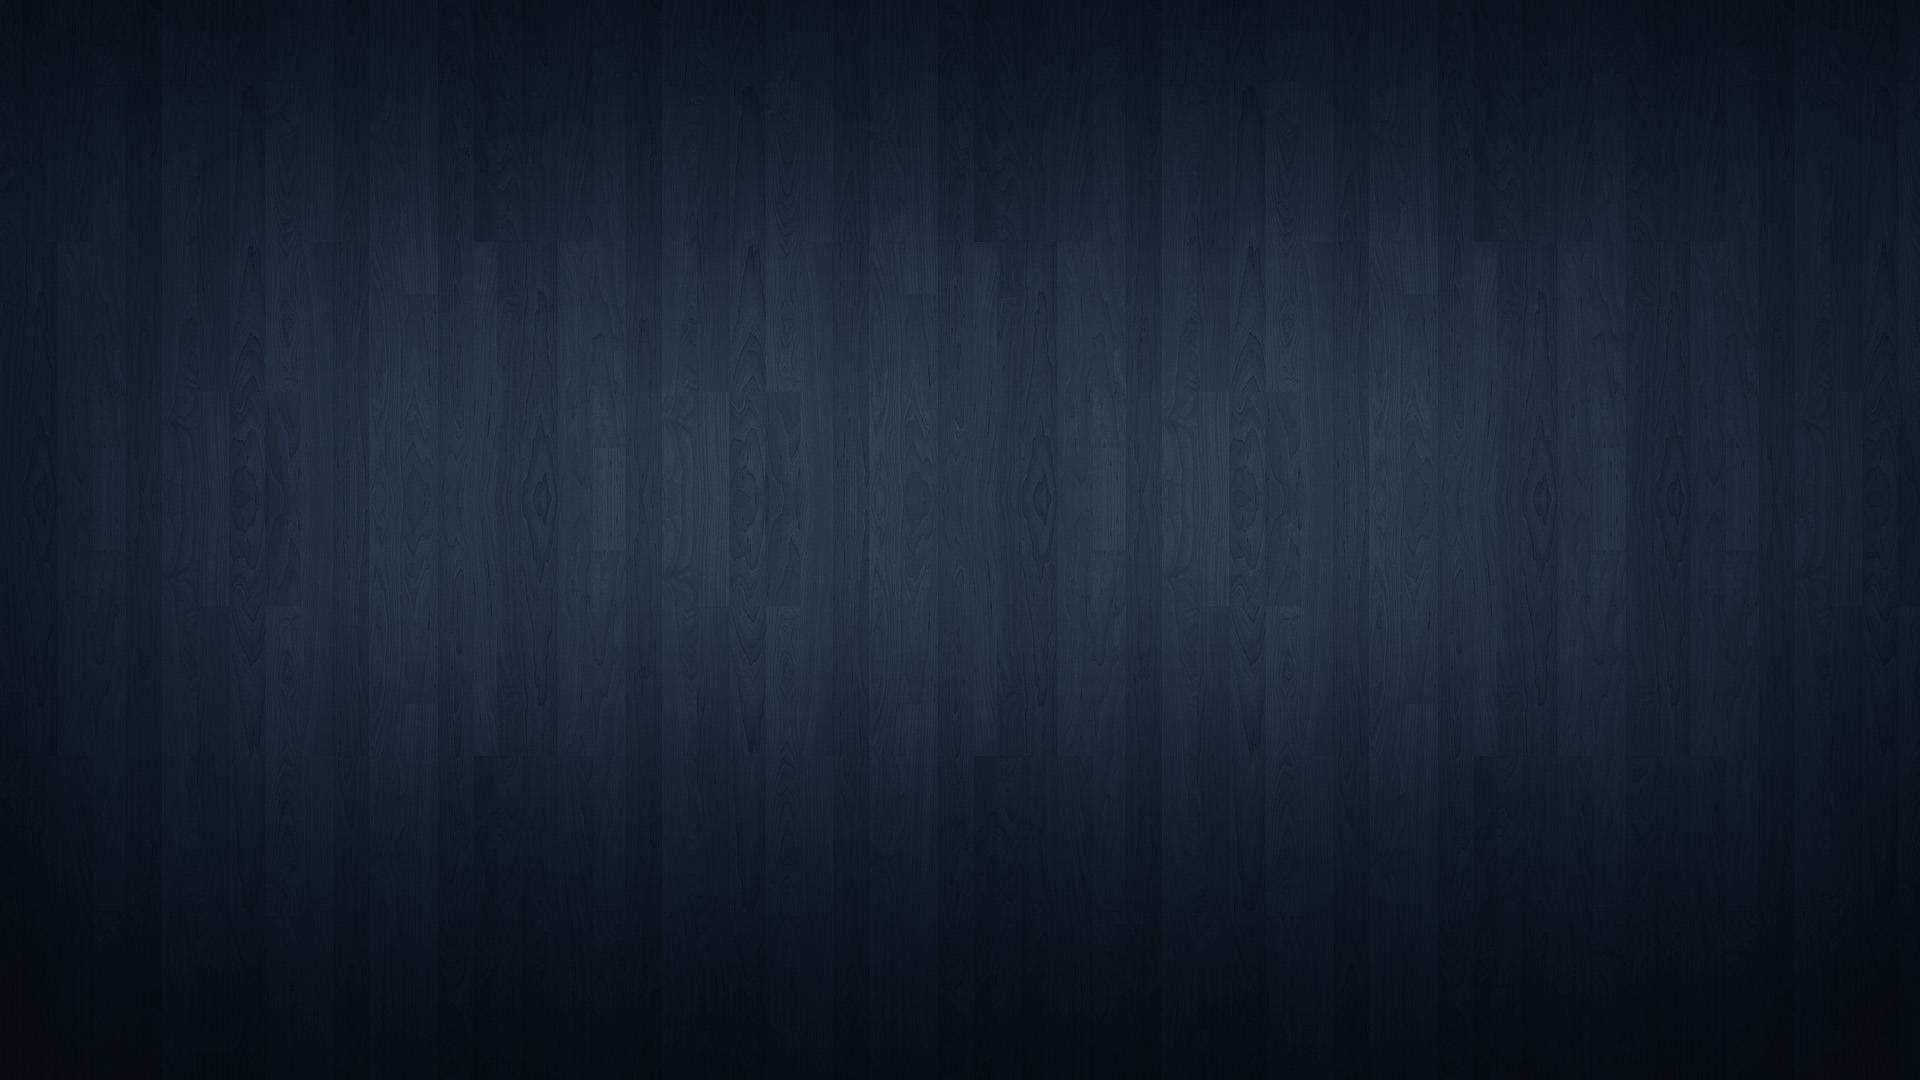 Dark Wood Wallpaper Hd Resolution Is Cool Wallpapers. Dark Wood Wallpaper Hd Resolution Is Cool Wallpapers   wall p